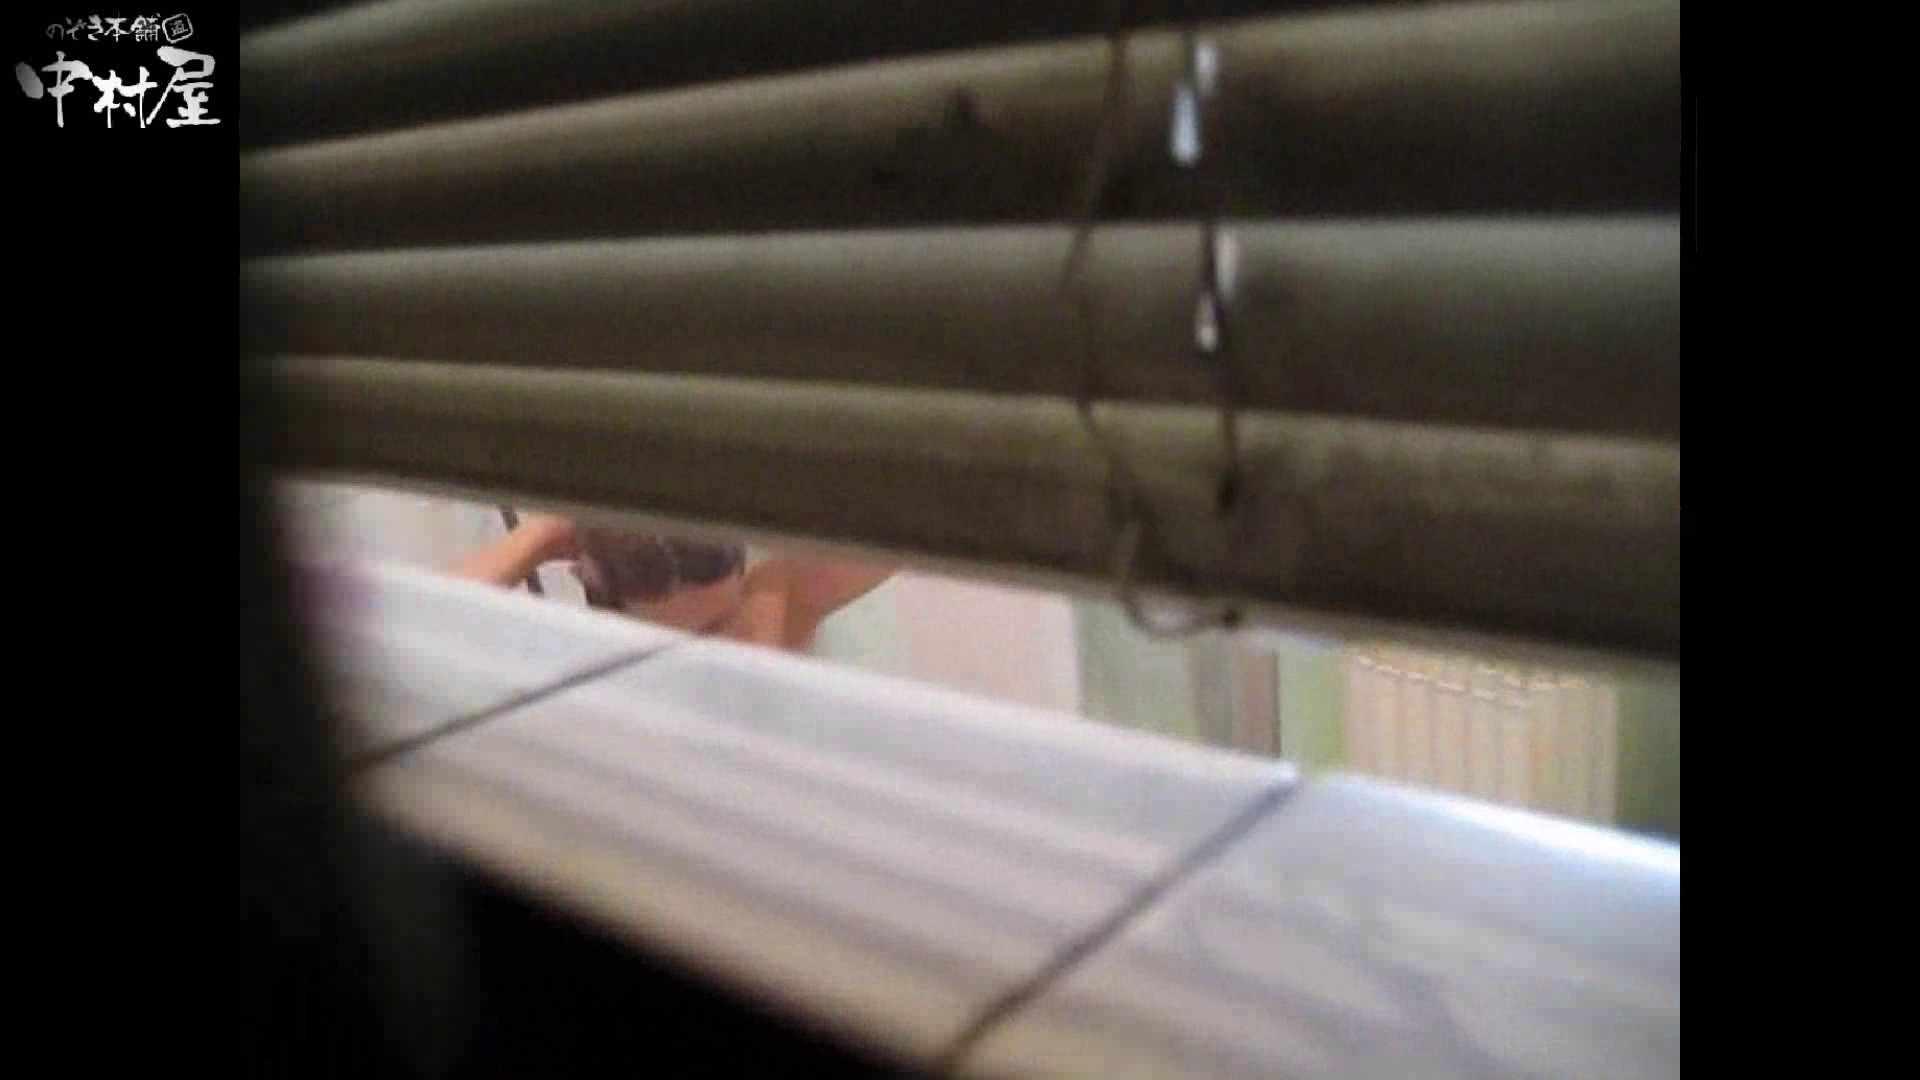 民家風呂専門盗撮師の超危険映像 vol.014後編 エロい美少女 セックス無修正動画無料 113PIX 34